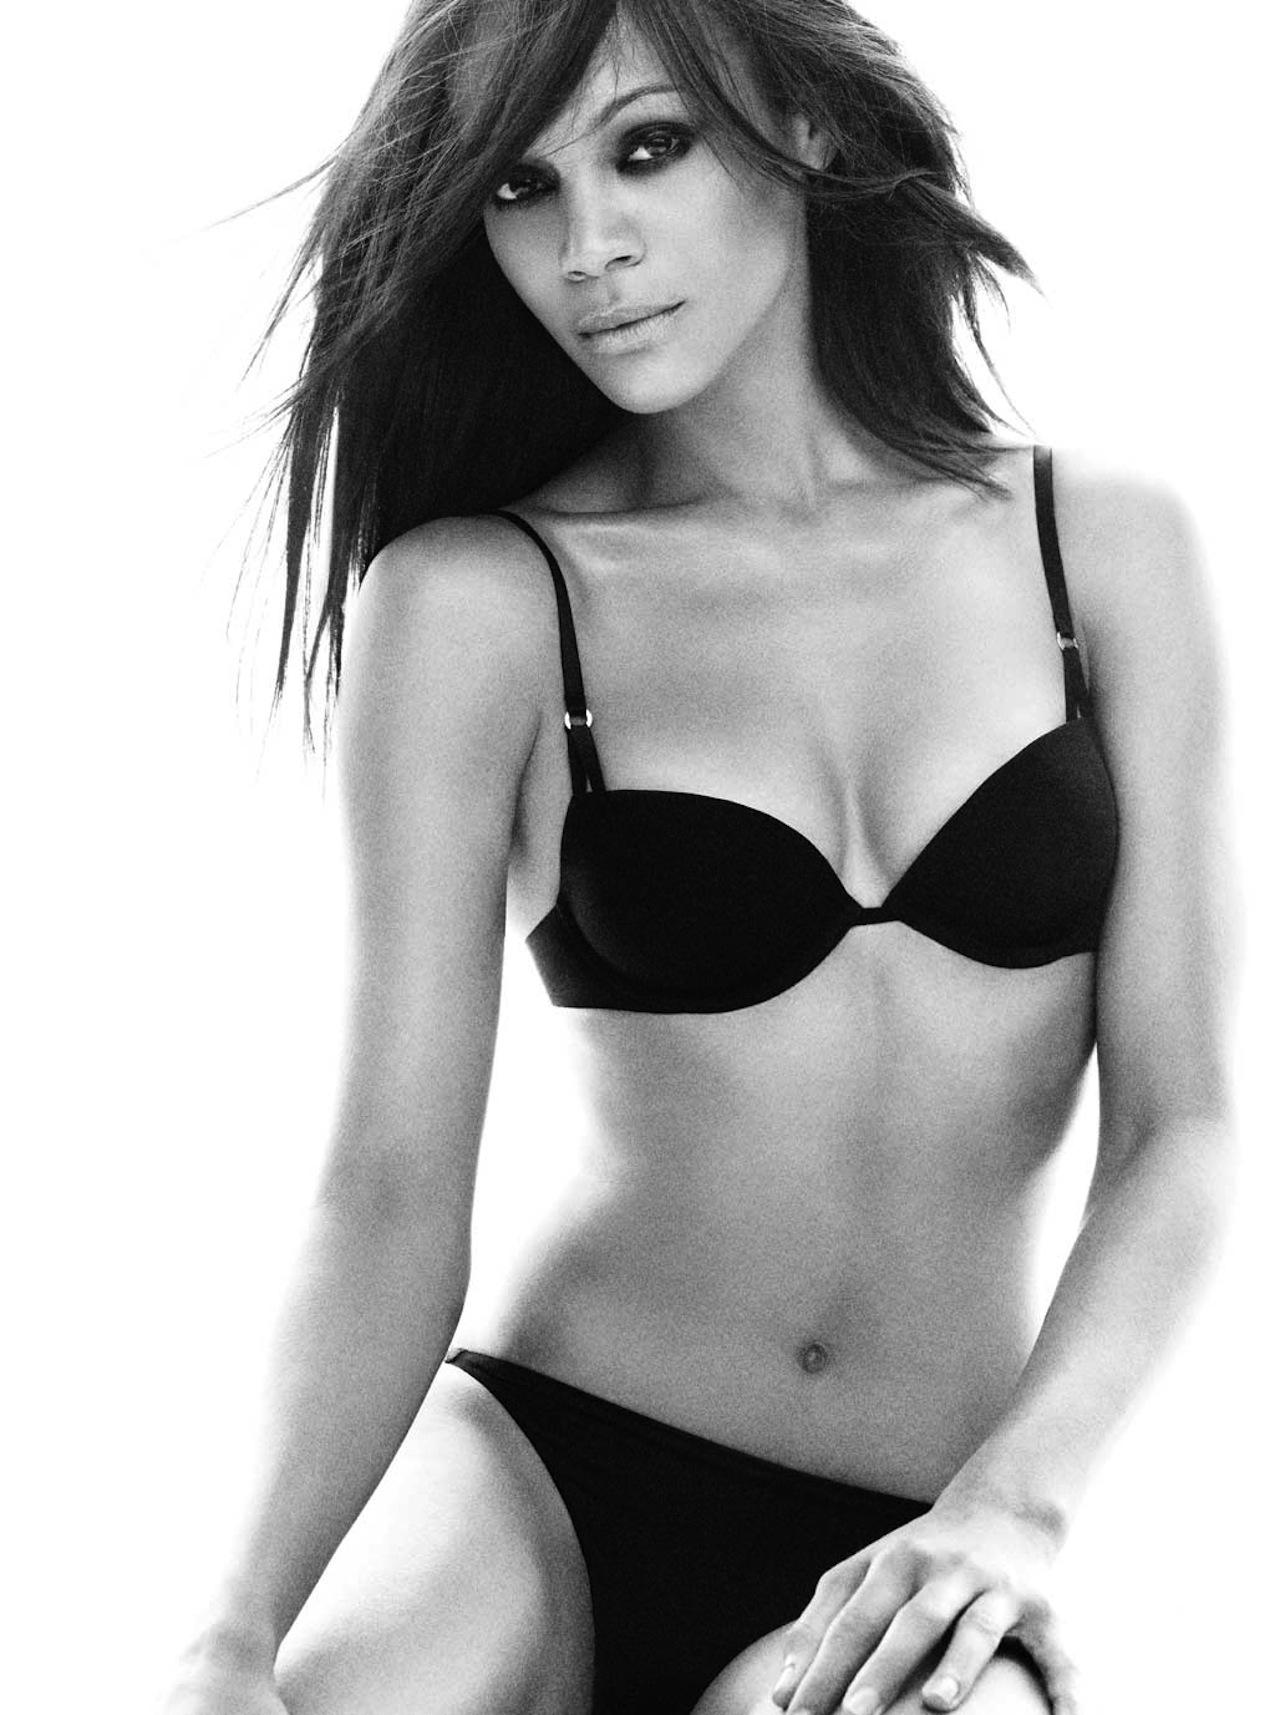 Sharapova Hd Wallpaper Sexy Zoe Saldana Height And Weights